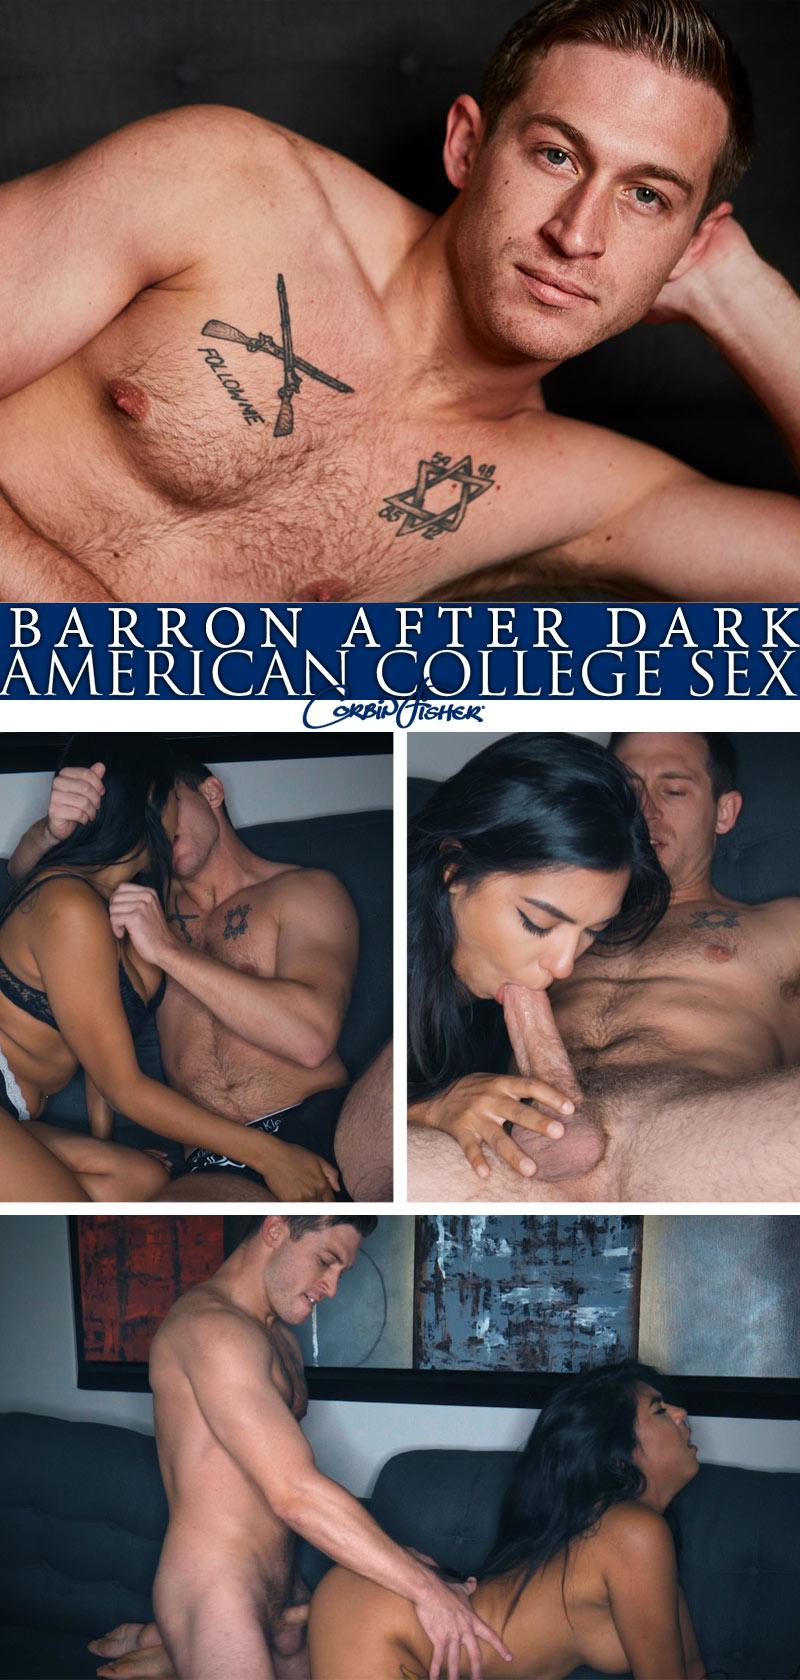 Barron After Dark at AmateurCollegeSex